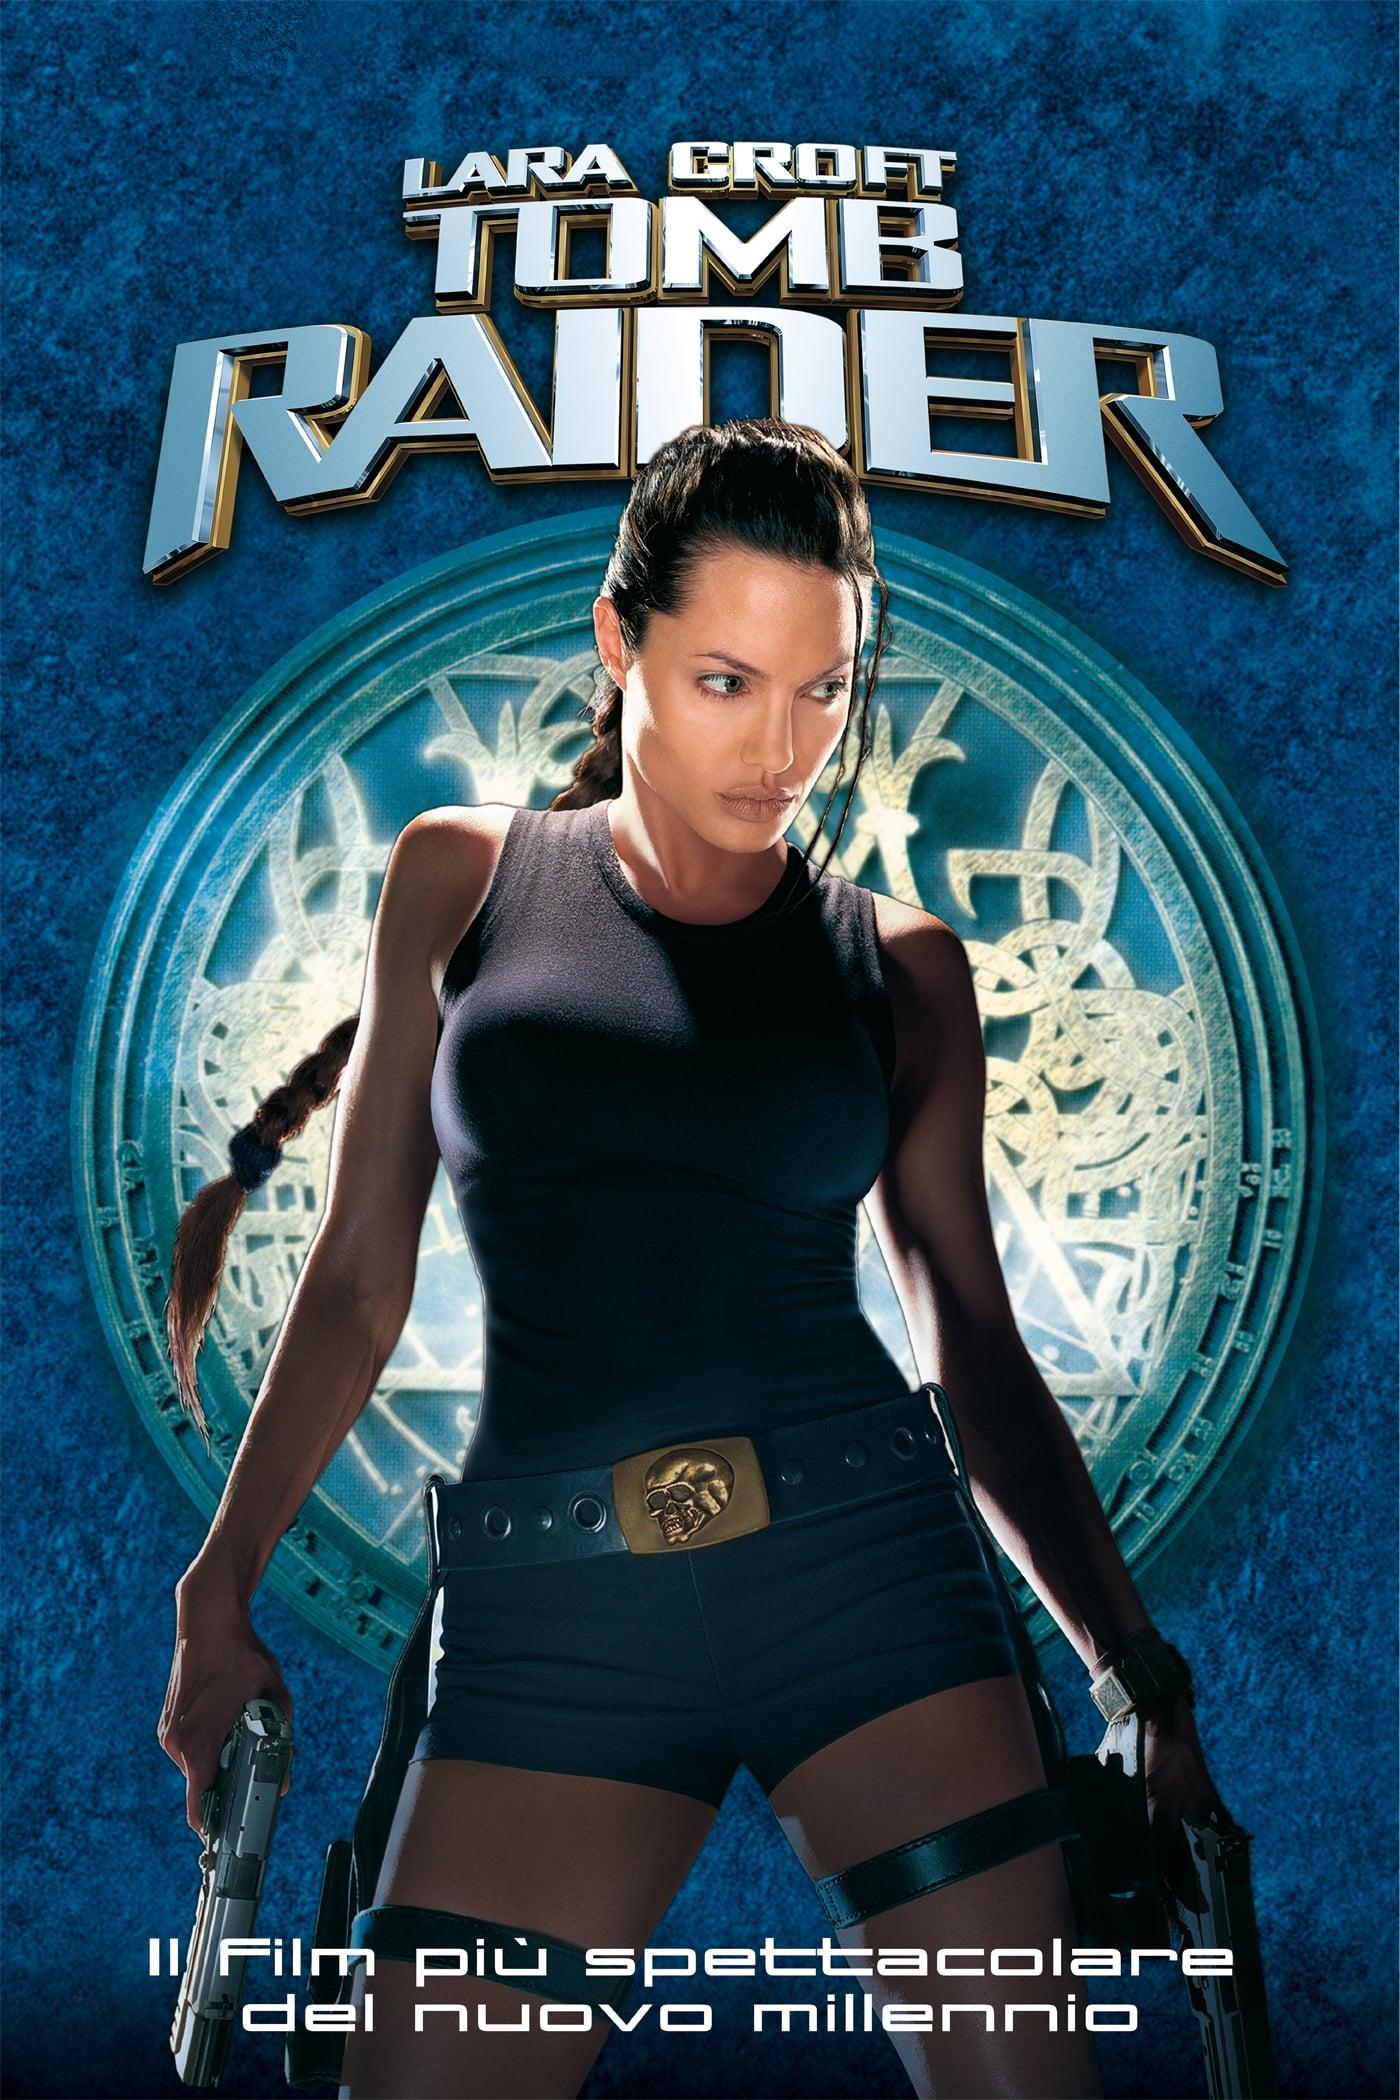 Lara Croft Tomb Raider 2001 Full Movie Online Free ...